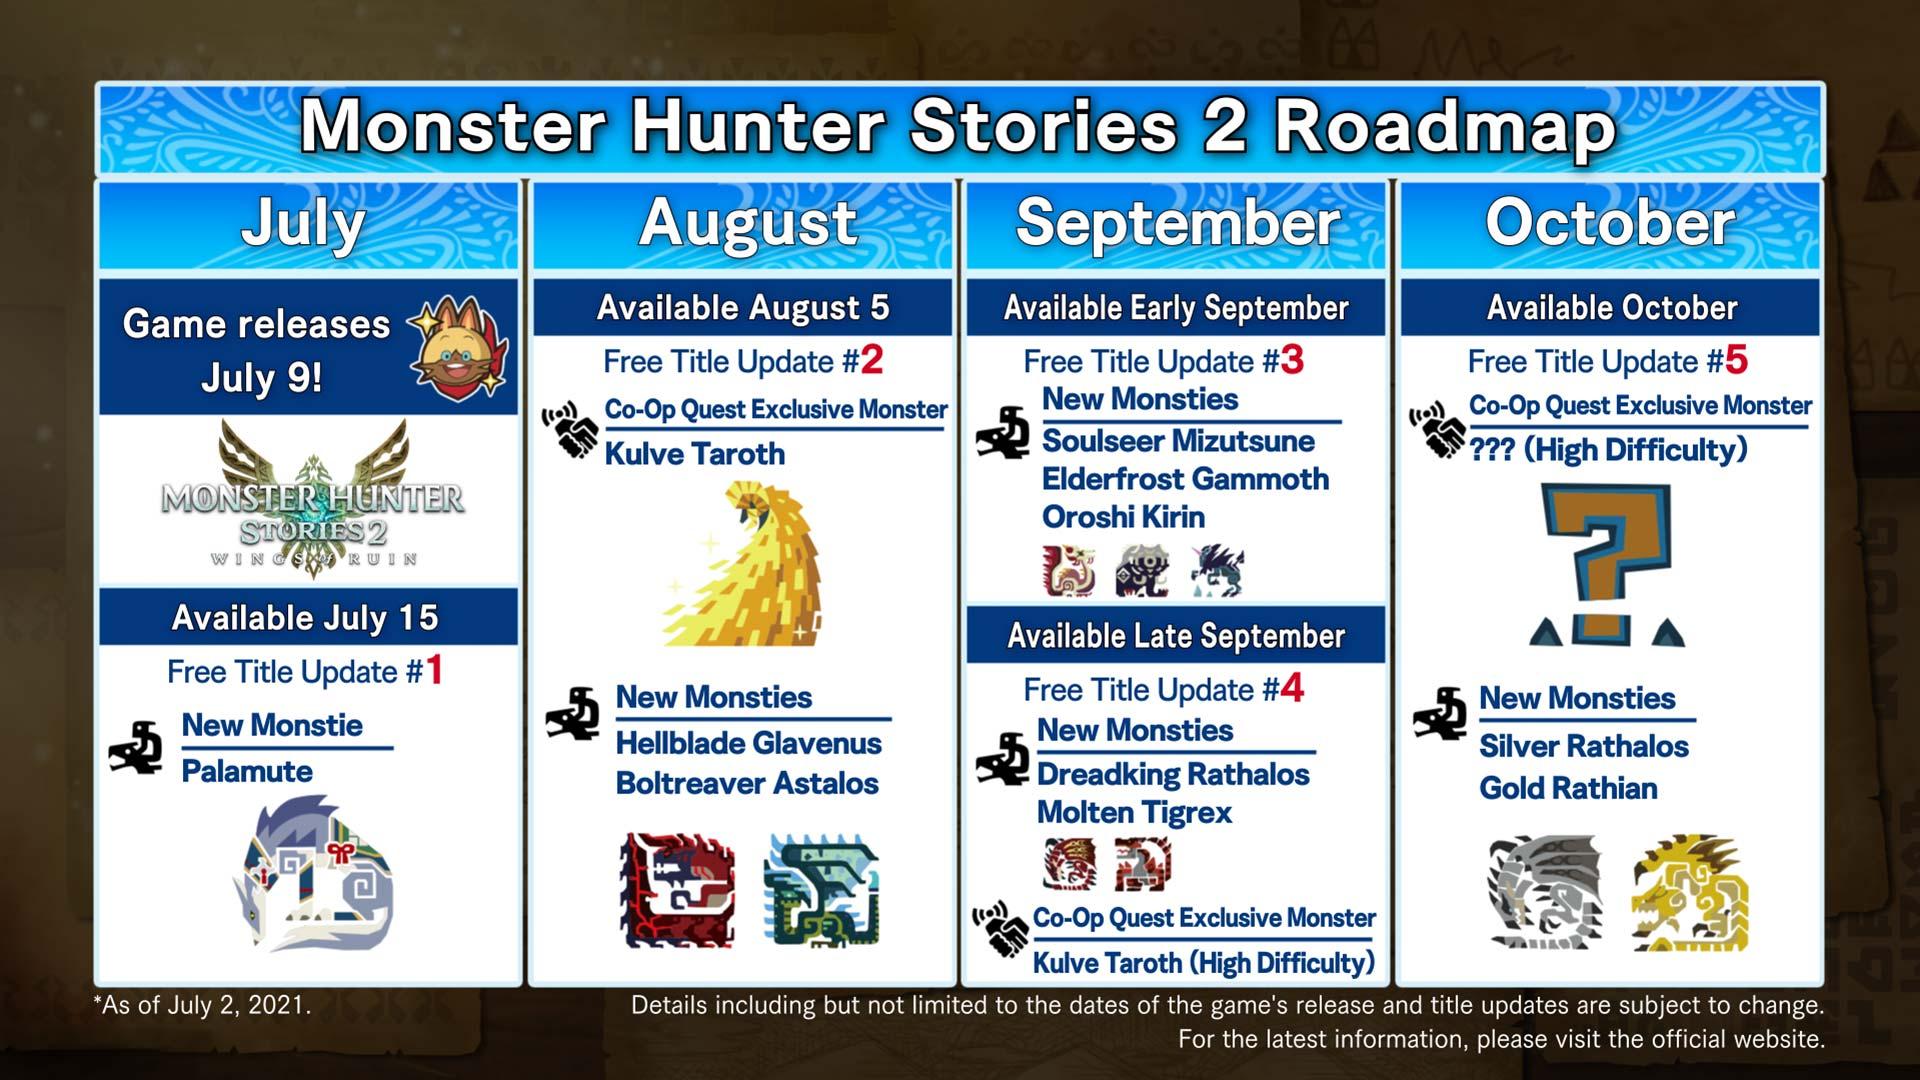 Monster-Hunter-Stories-2-Roadmap-After-Release-Date